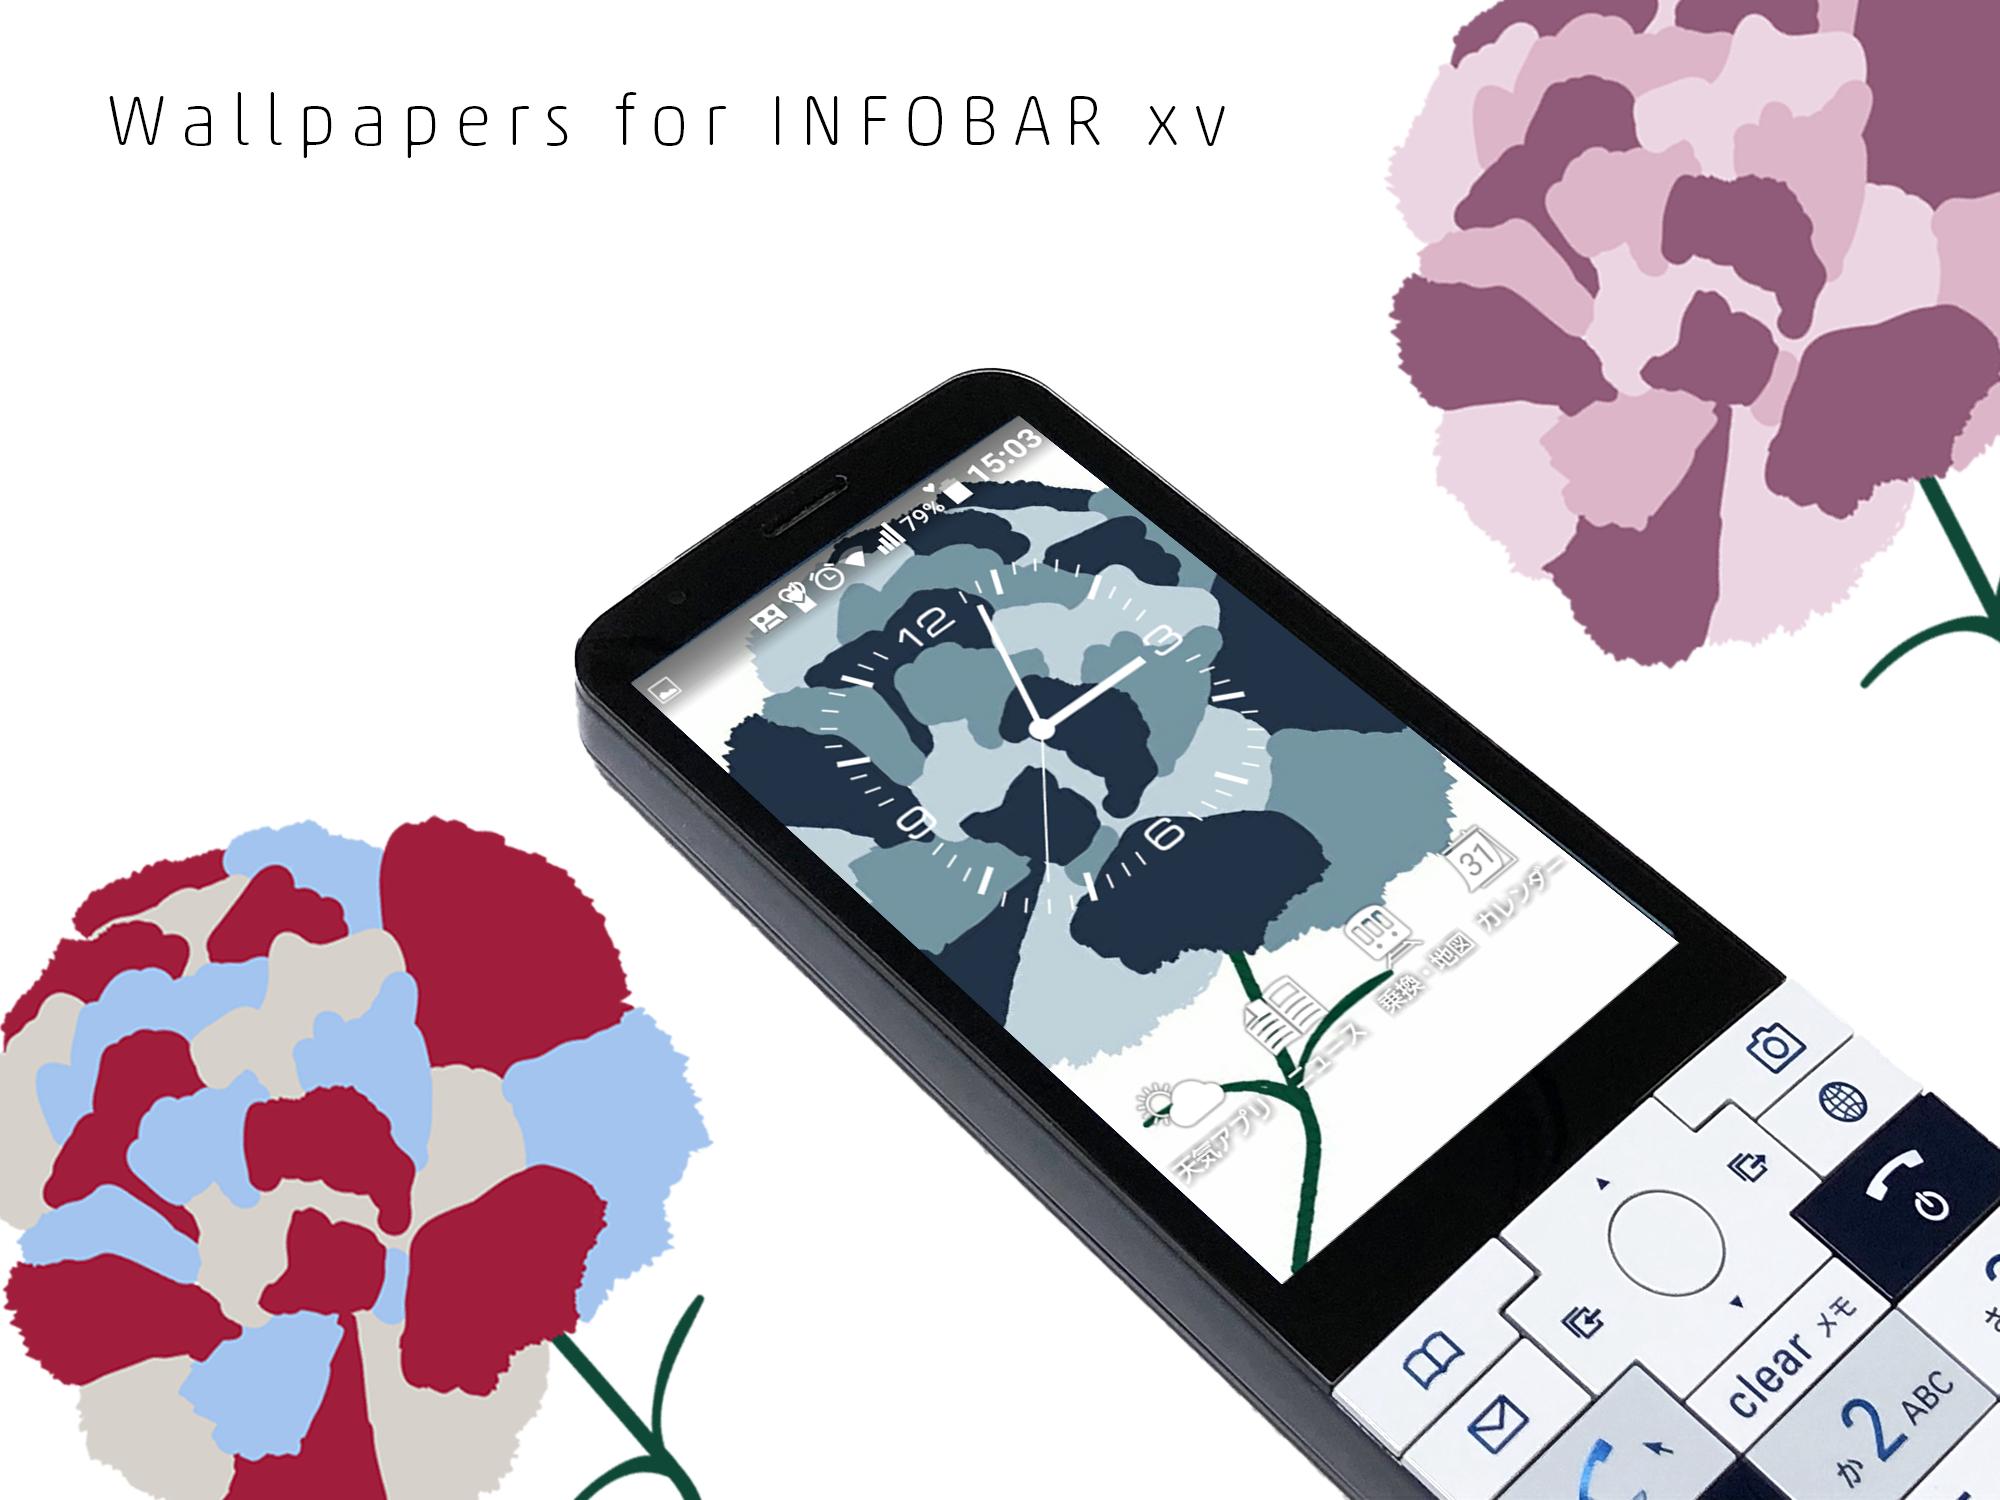 INFOBAR xv用壁紙 | カーネーション